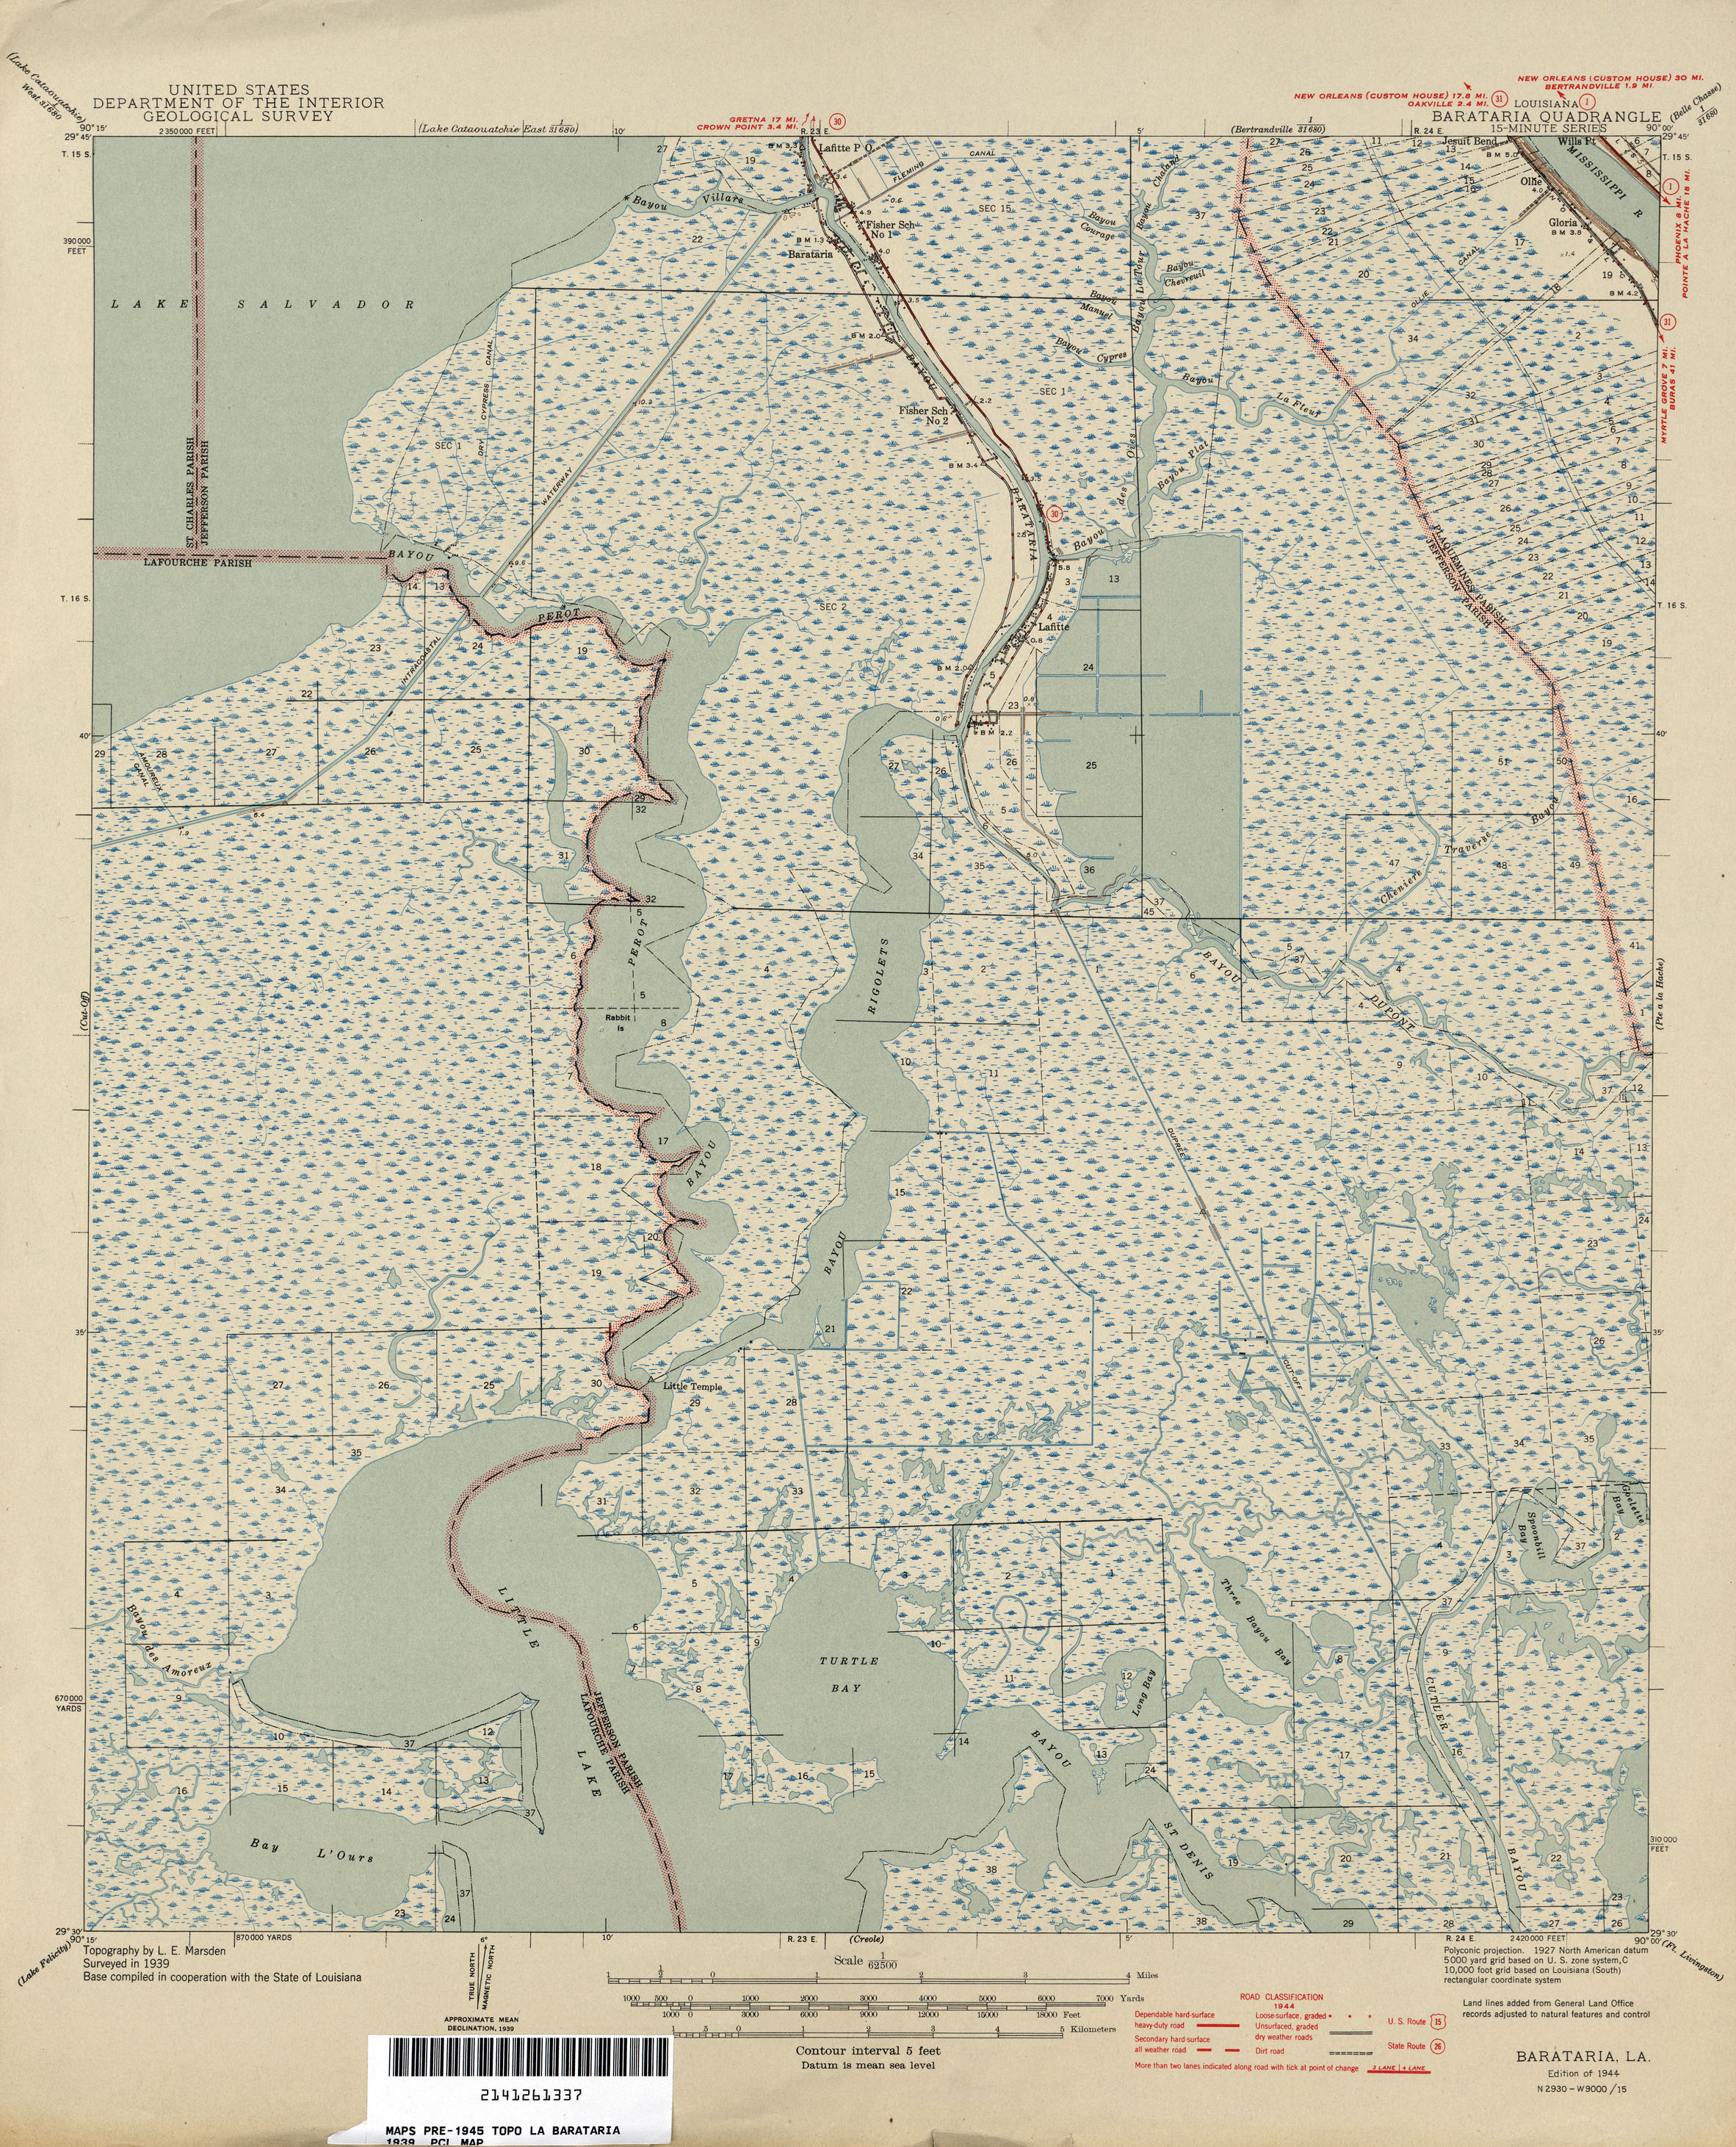 Louisiana Topographic Maps PerryCastañeda Map Collection UT - Historic maps louisiana